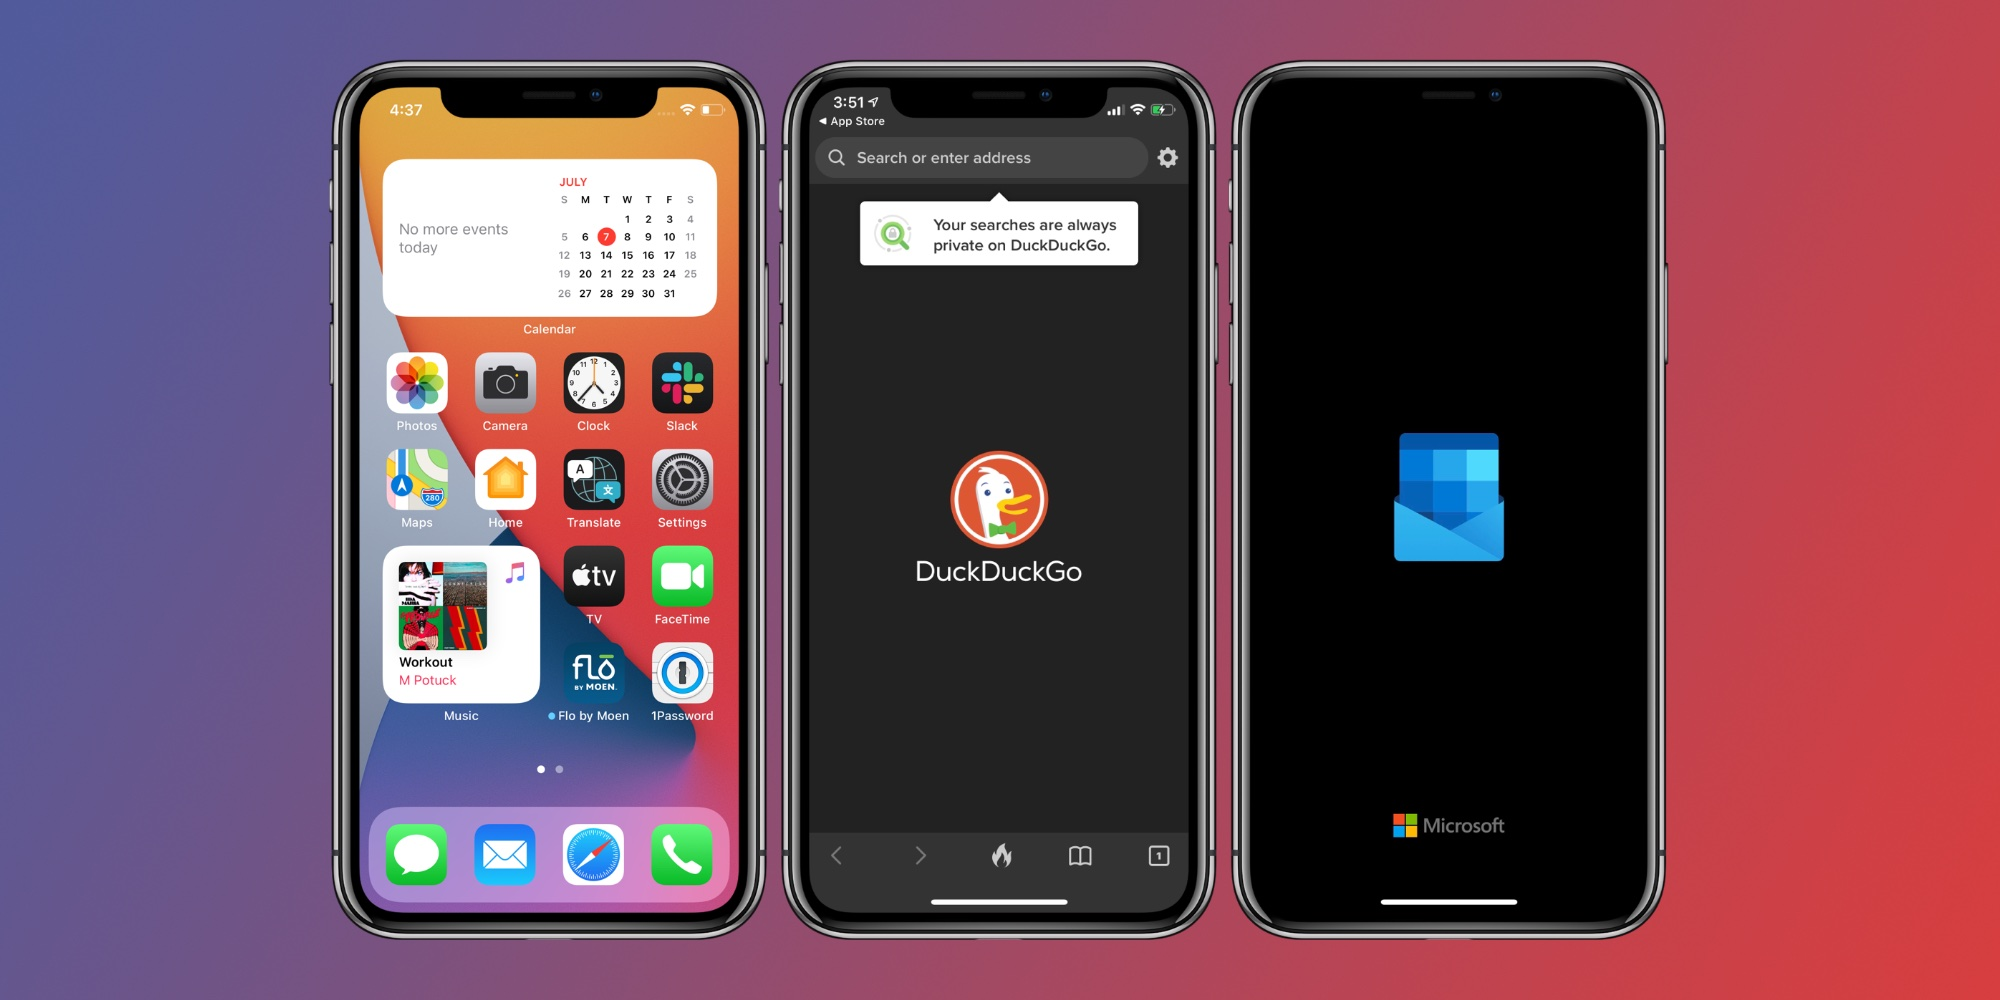 change default web browser iPhone ipad - sample image